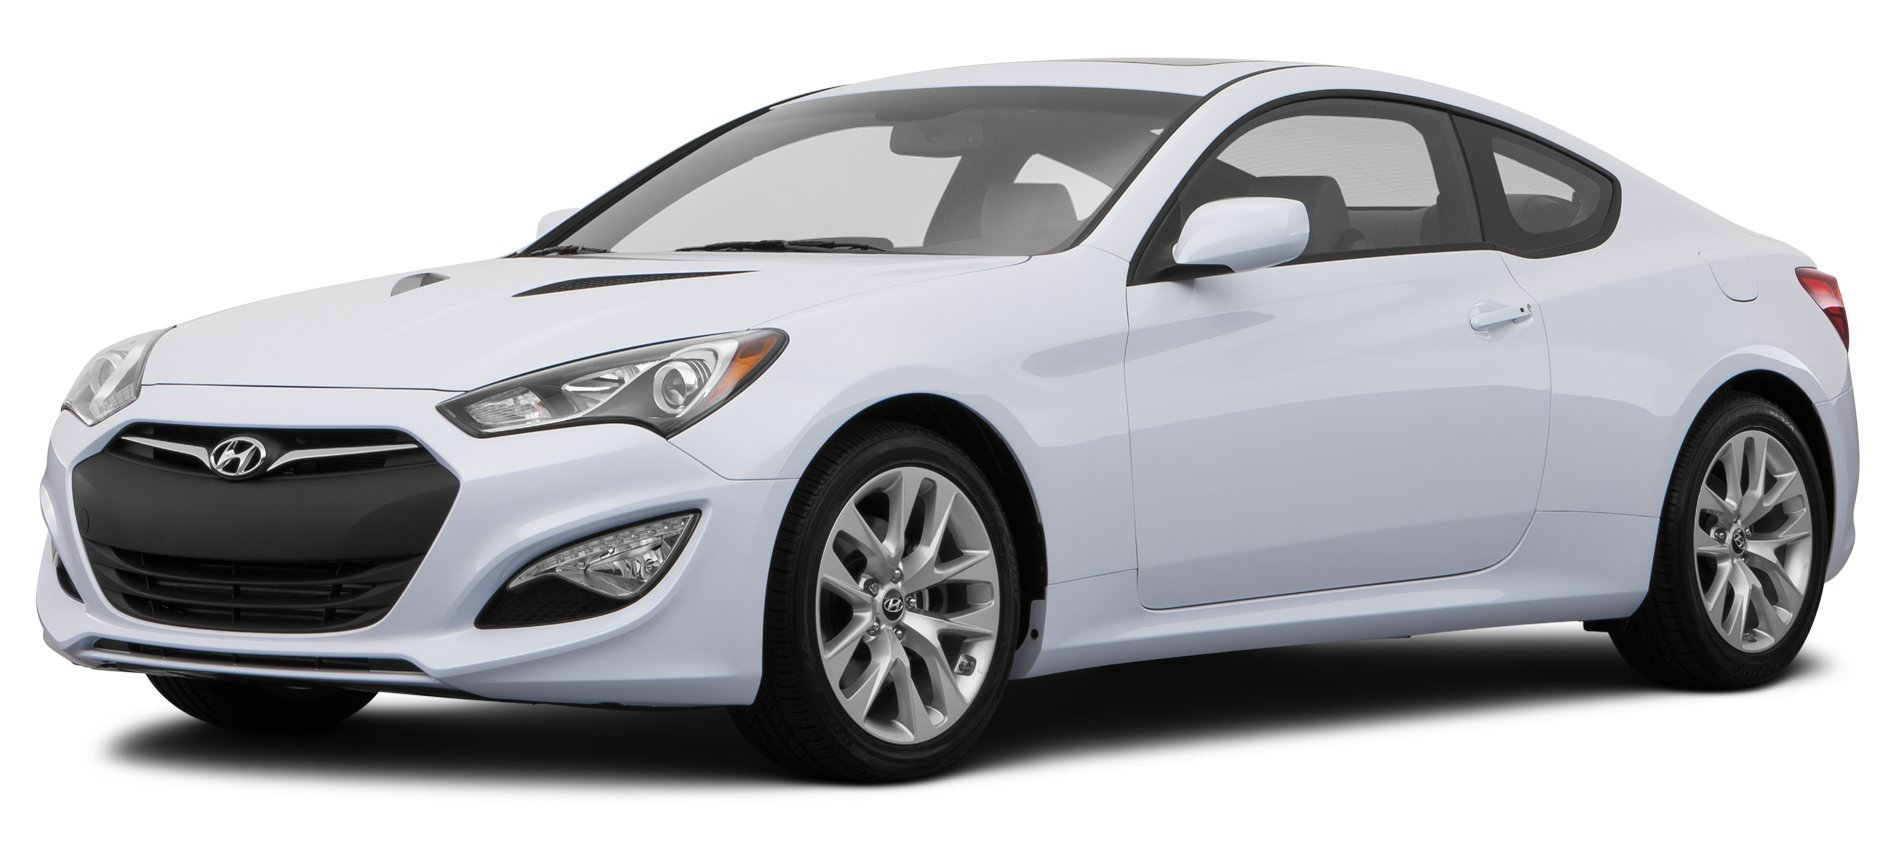 2014 Hyundai Genesis Coupe 2.0T, 2-Door 4-Cylinder Automatic Transmission ...